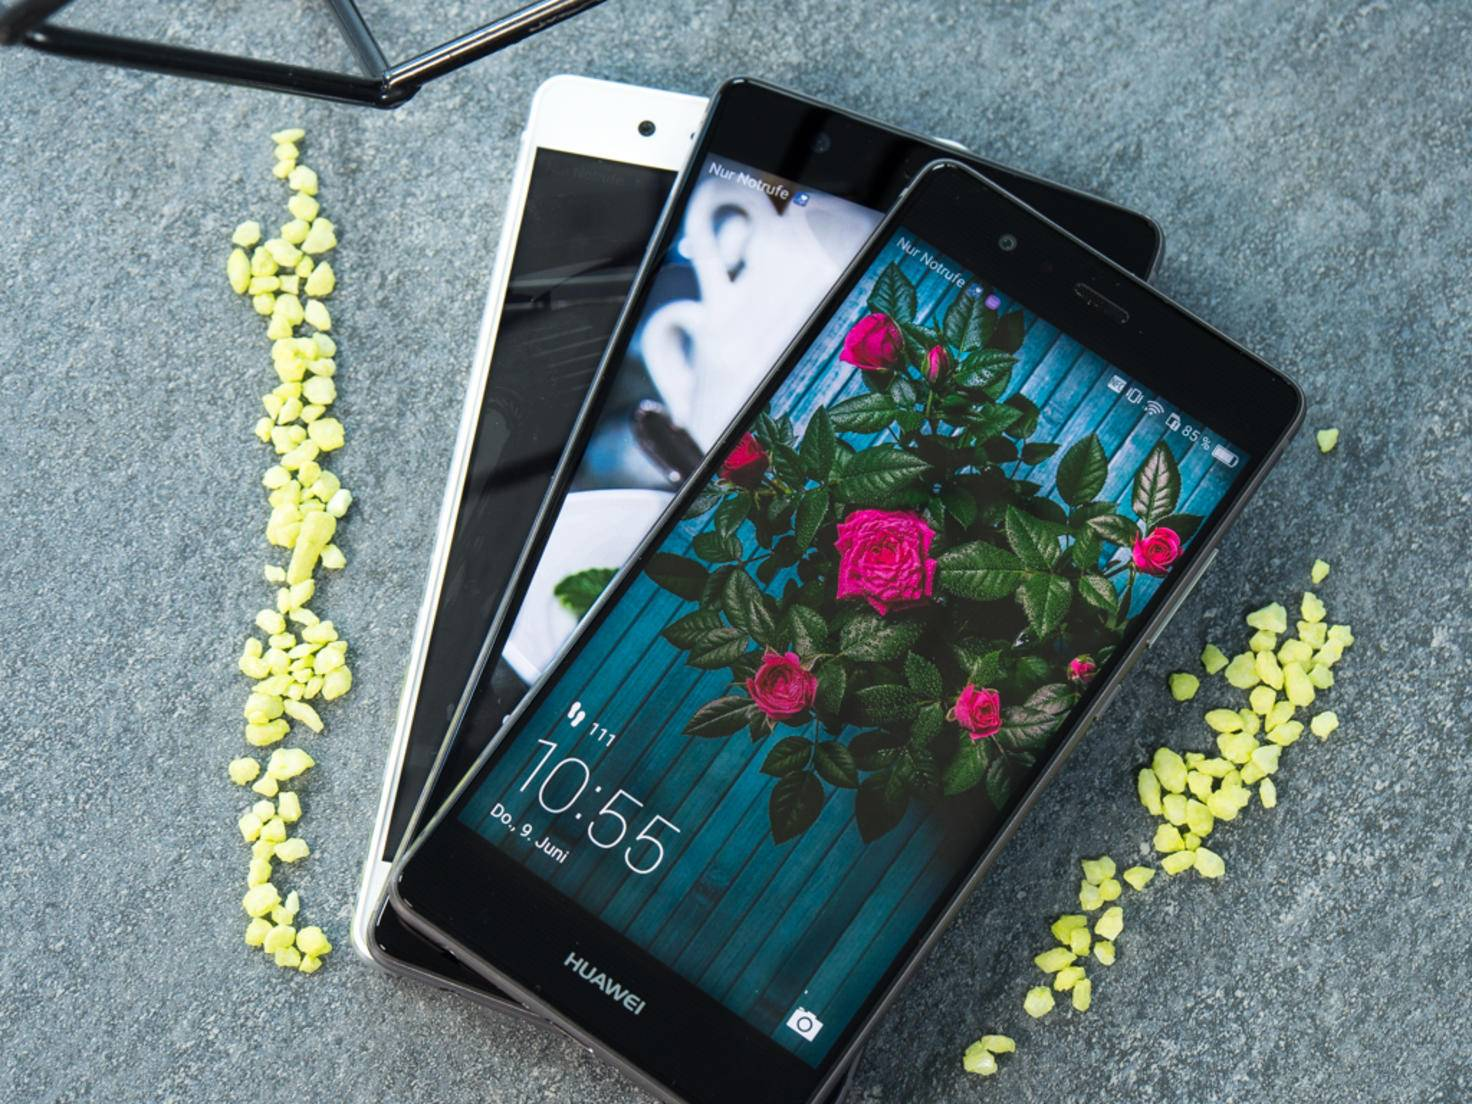 Huawei P9-Familie